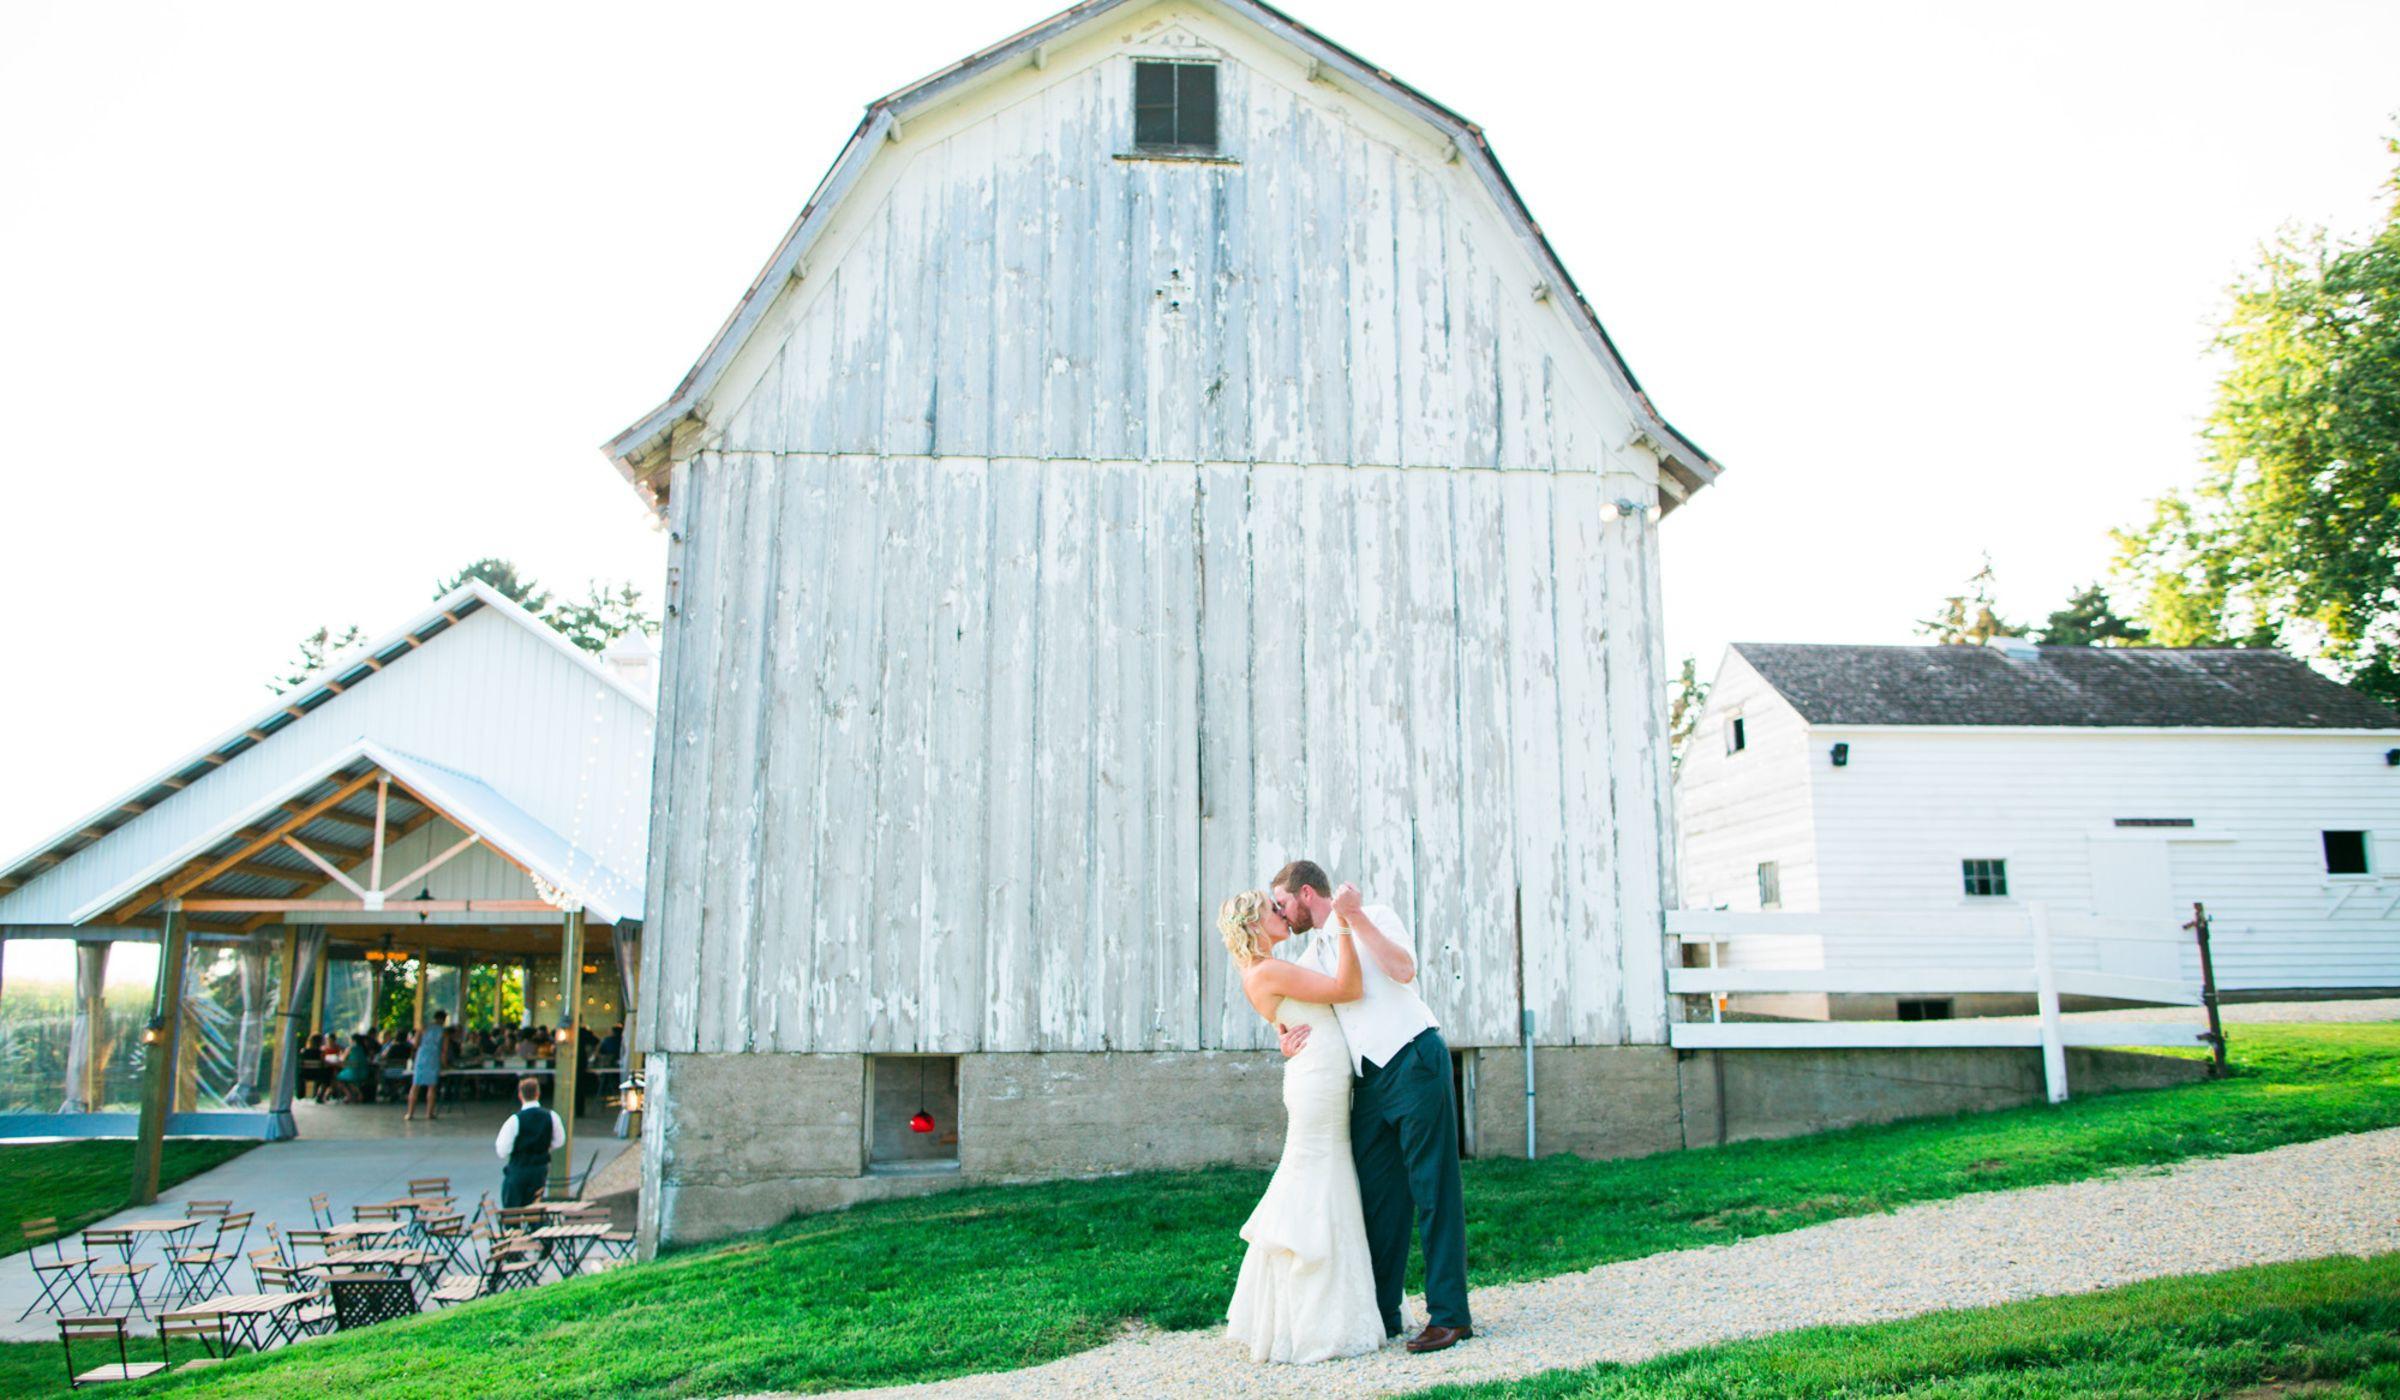 Wedding Venues Mn  7 Minnesota Barn Wedding Venues Perfect for Rustic Couples